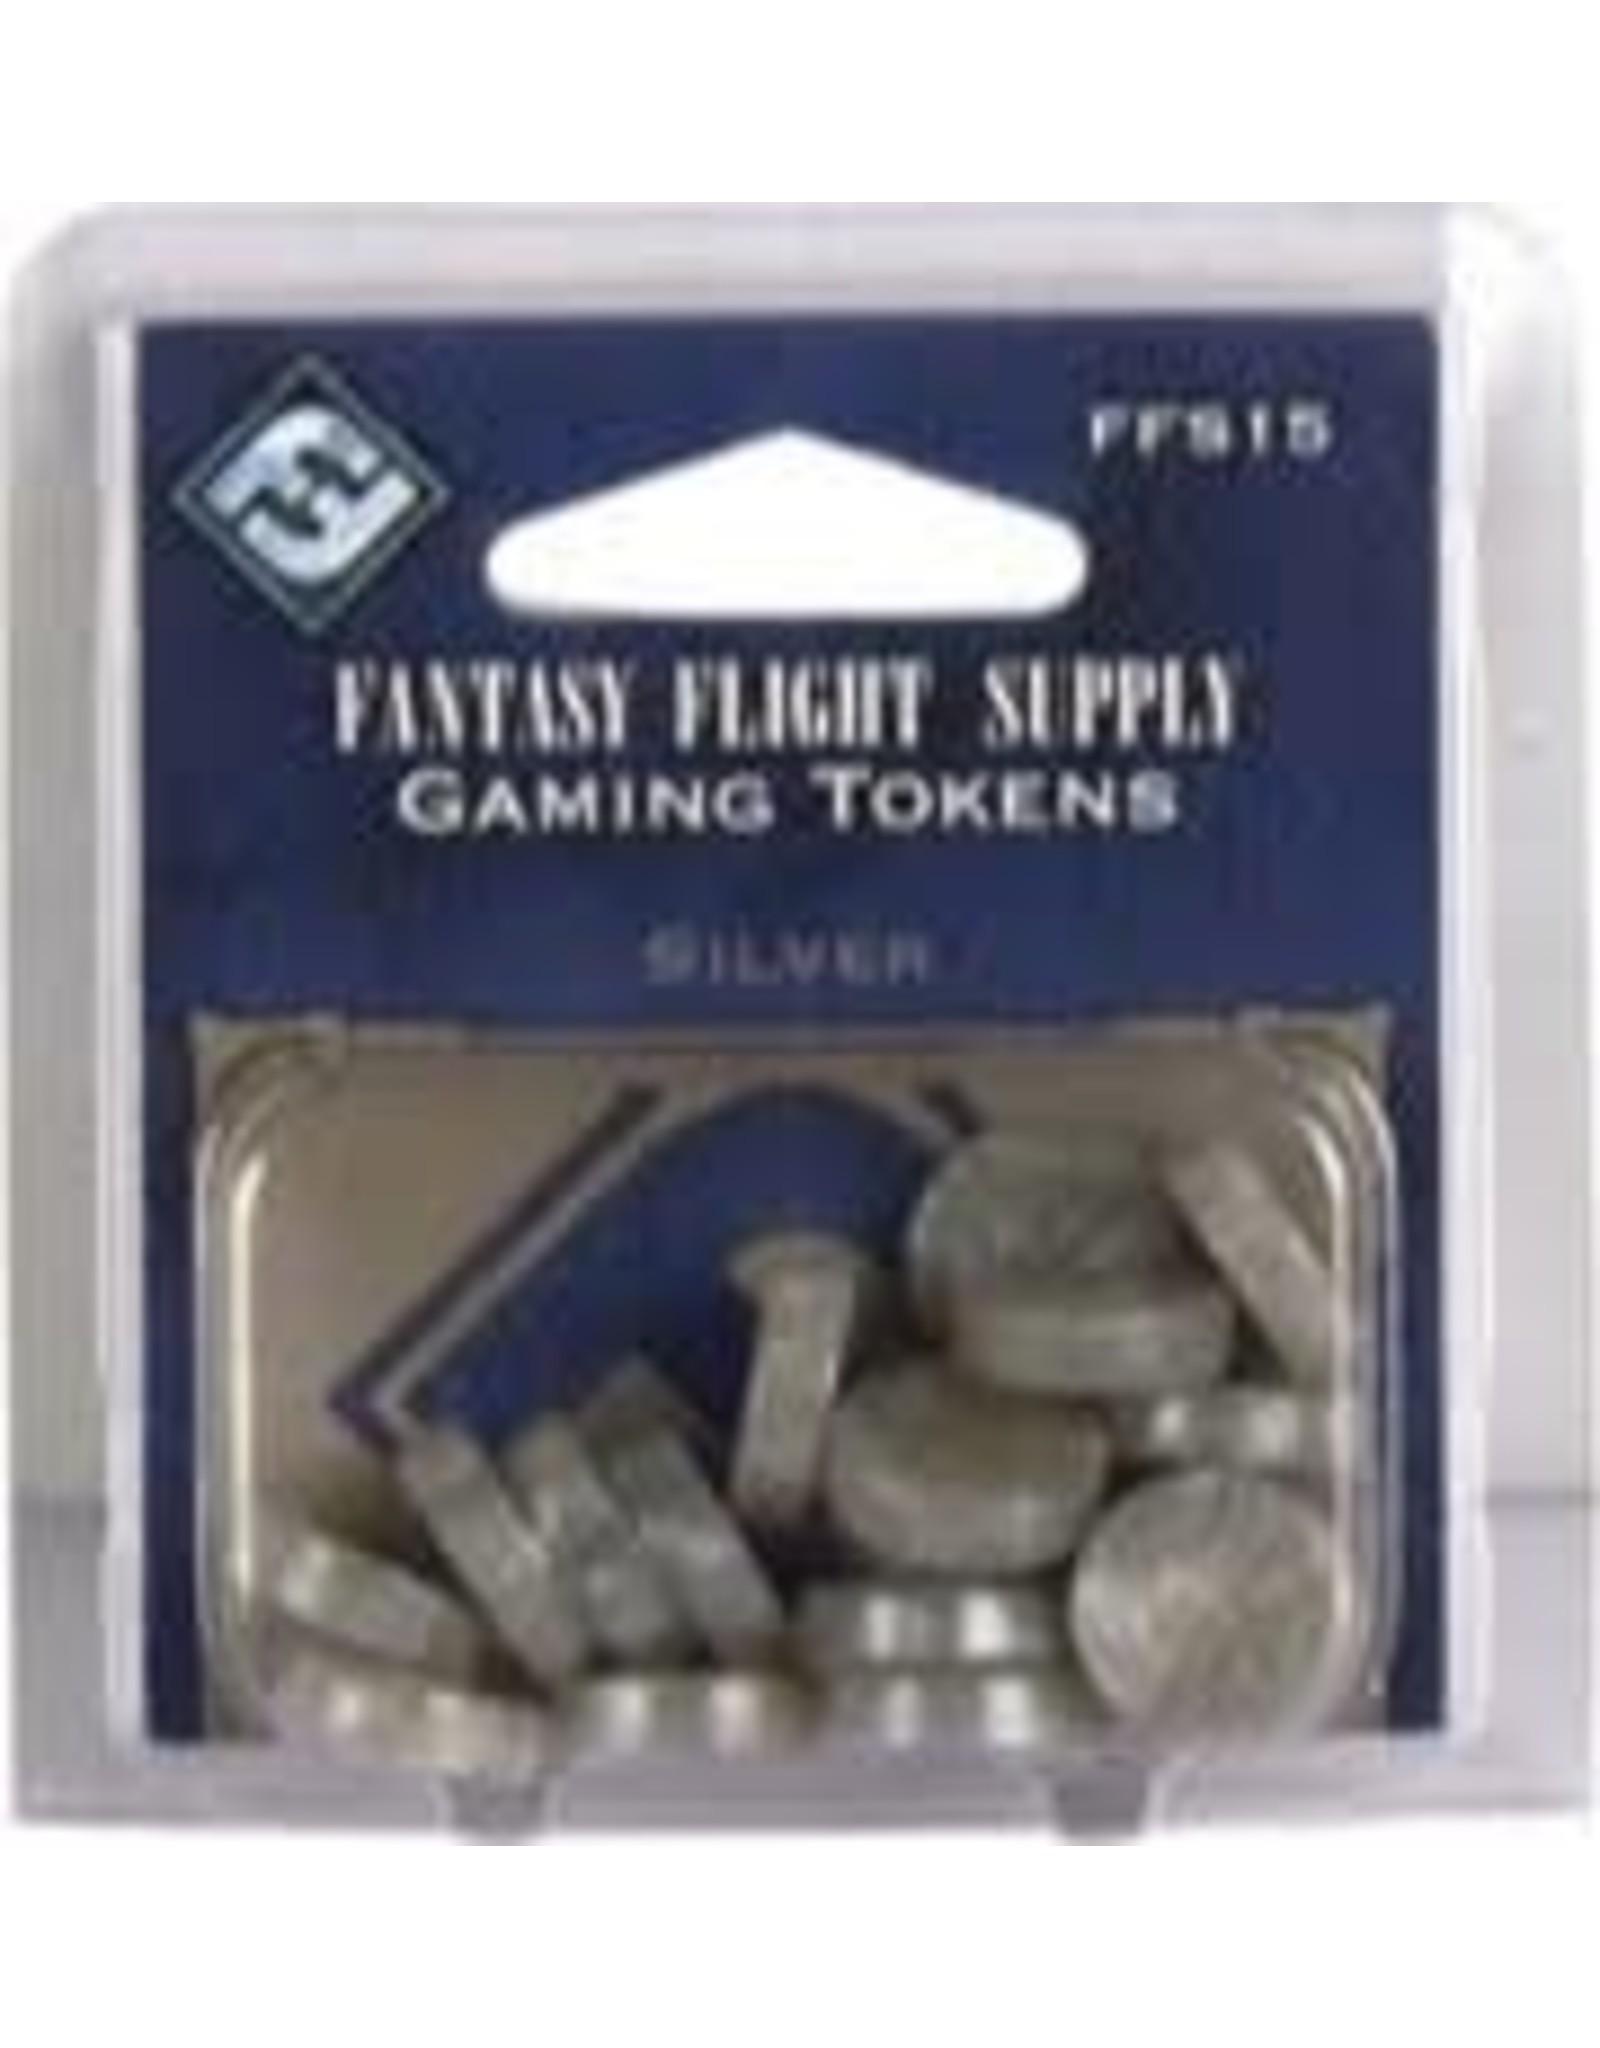 Fantasy Flight Games Gaming Tokens: Silver